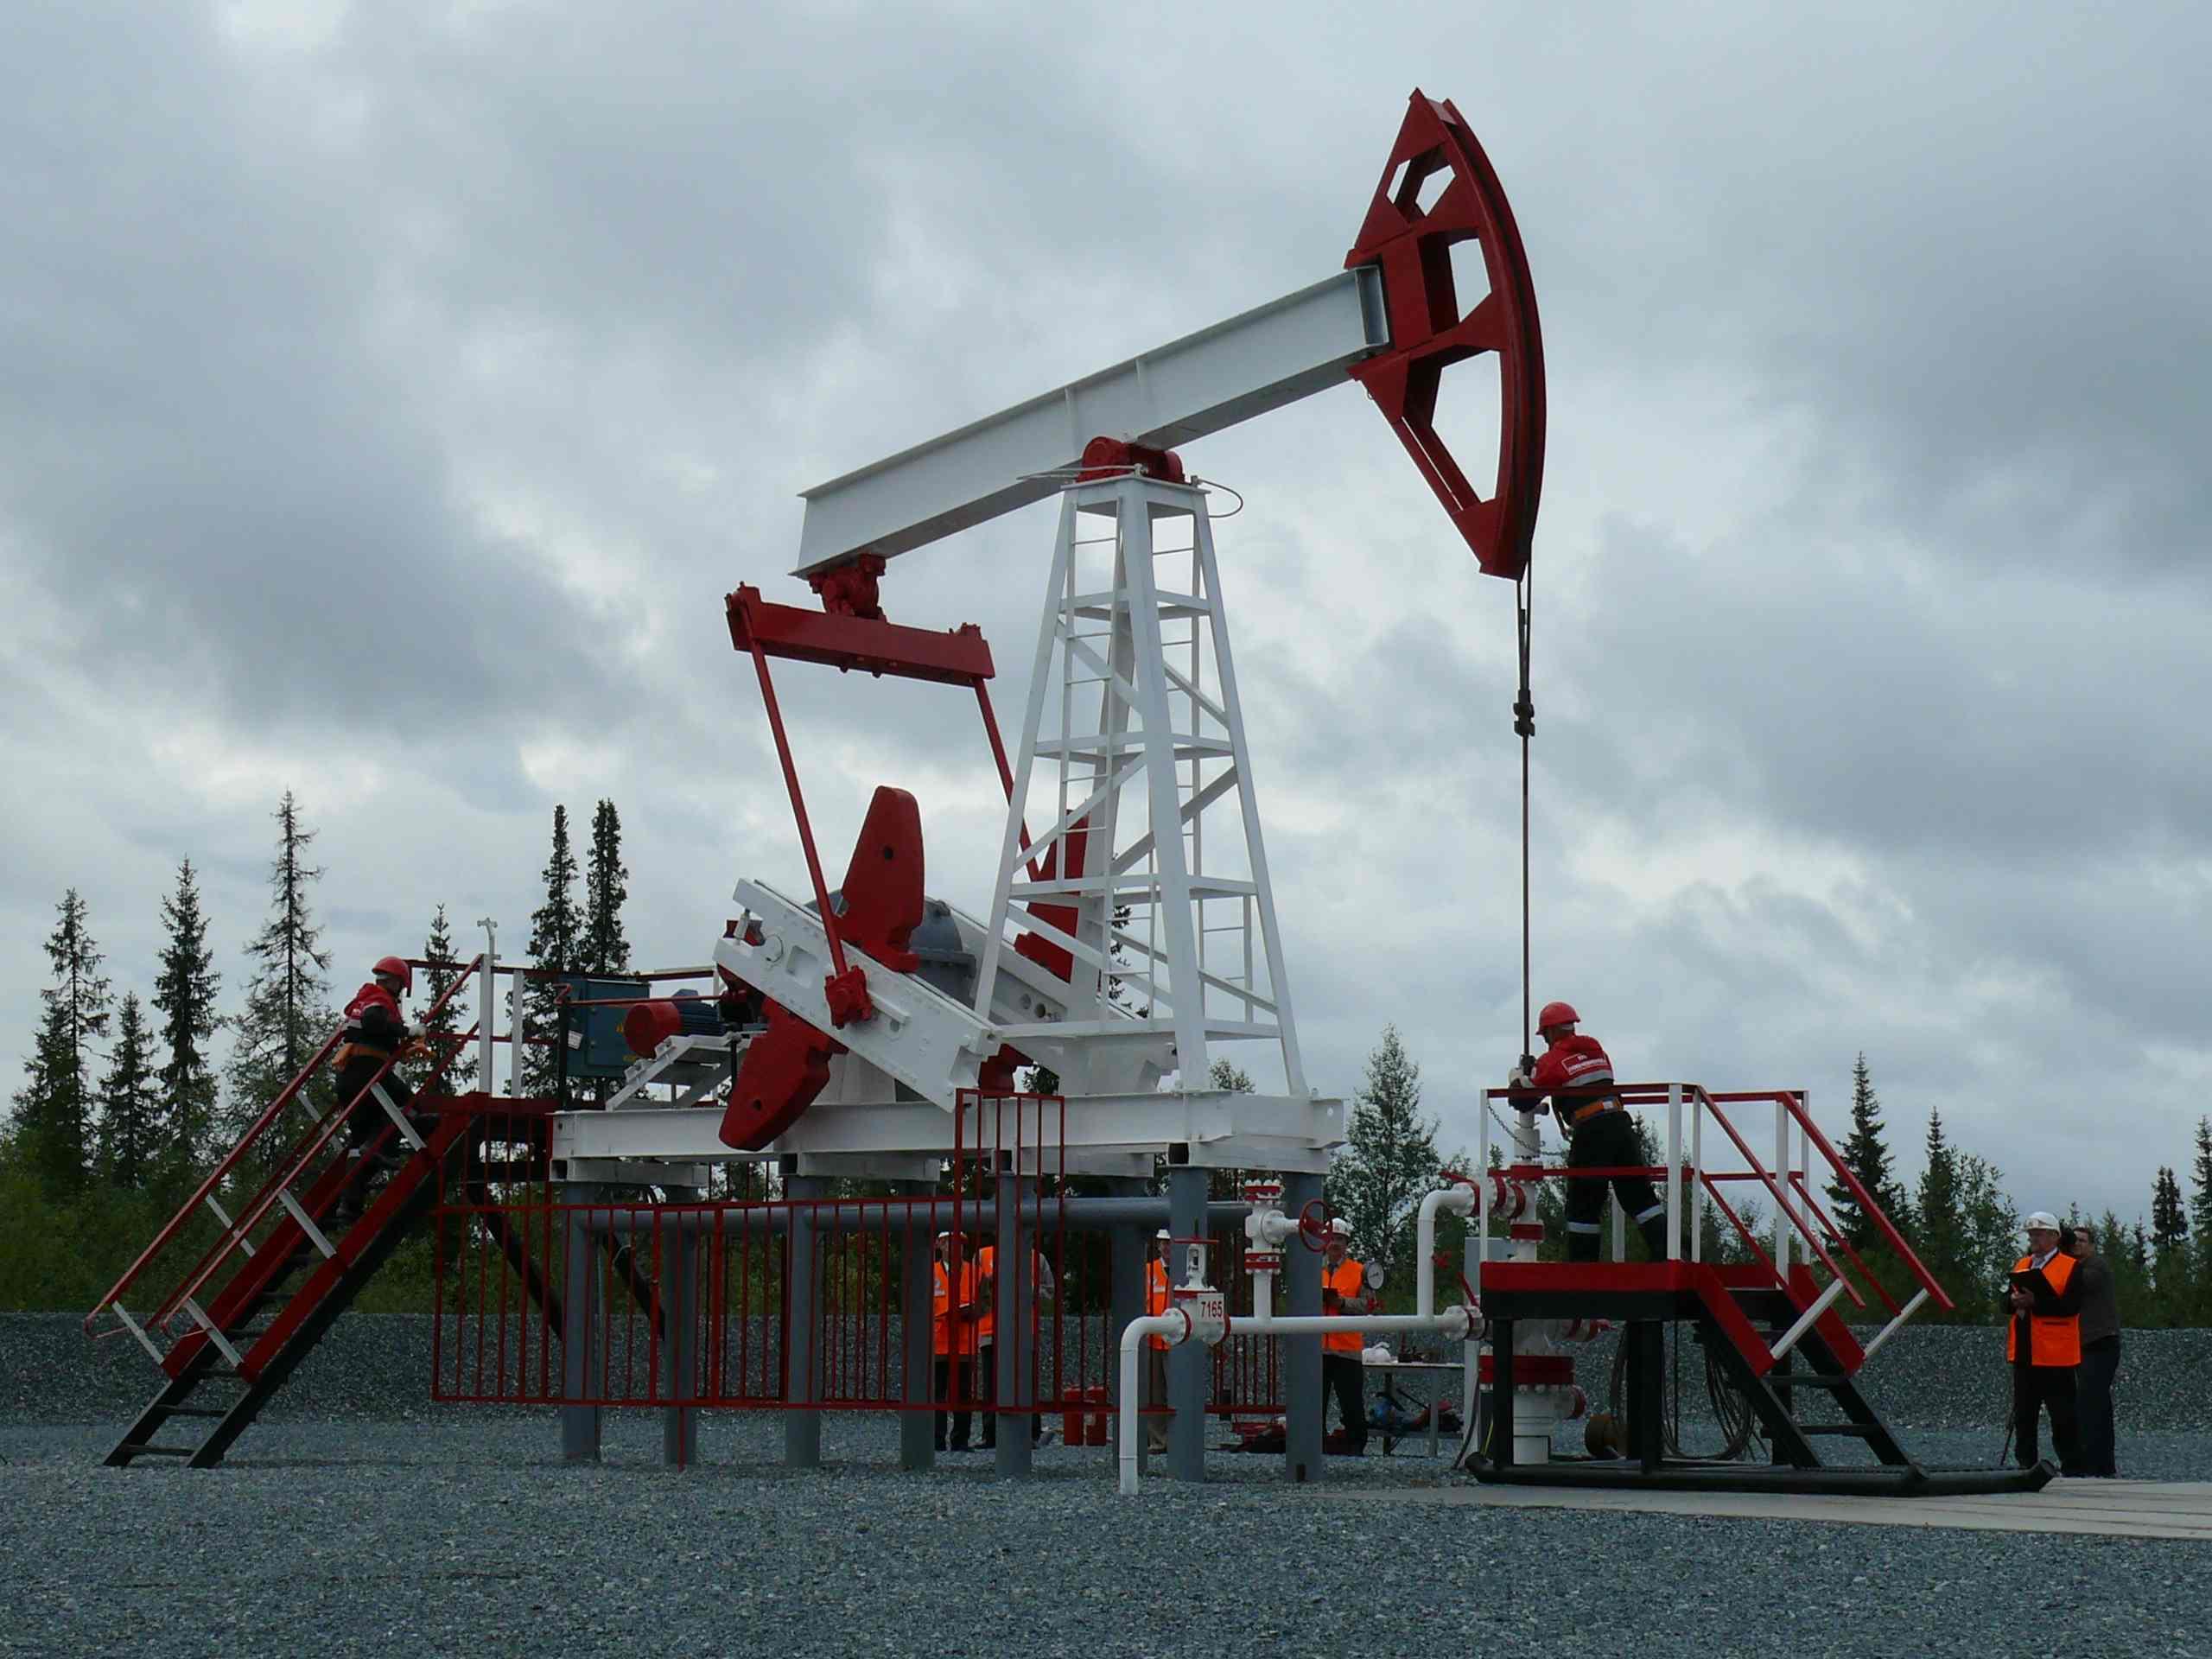 Brent crude price rises above $45 per barrel again